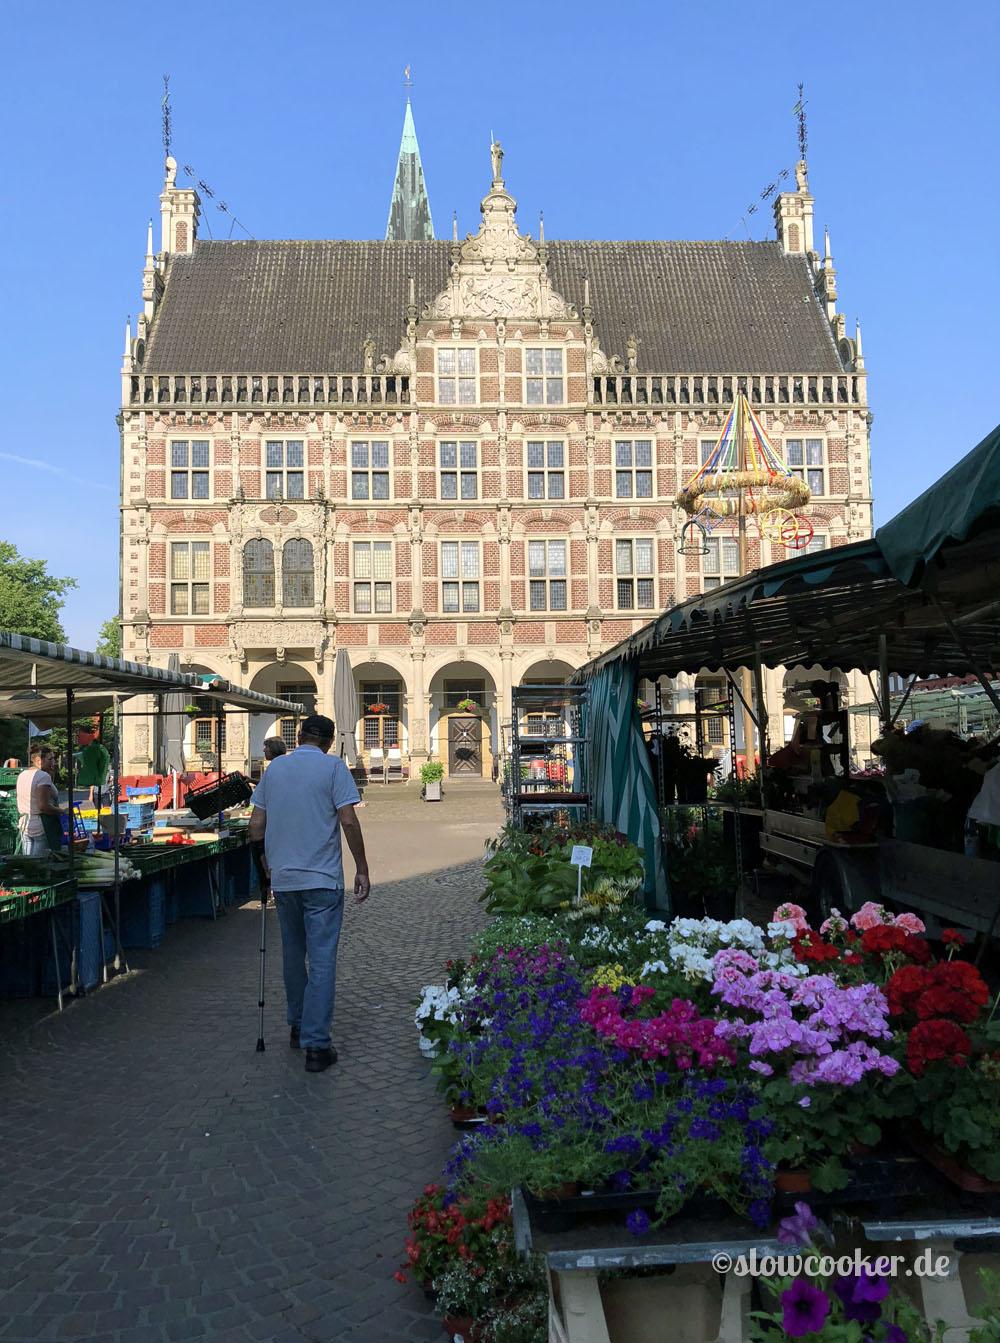 Marktspaziergang in Bocholt